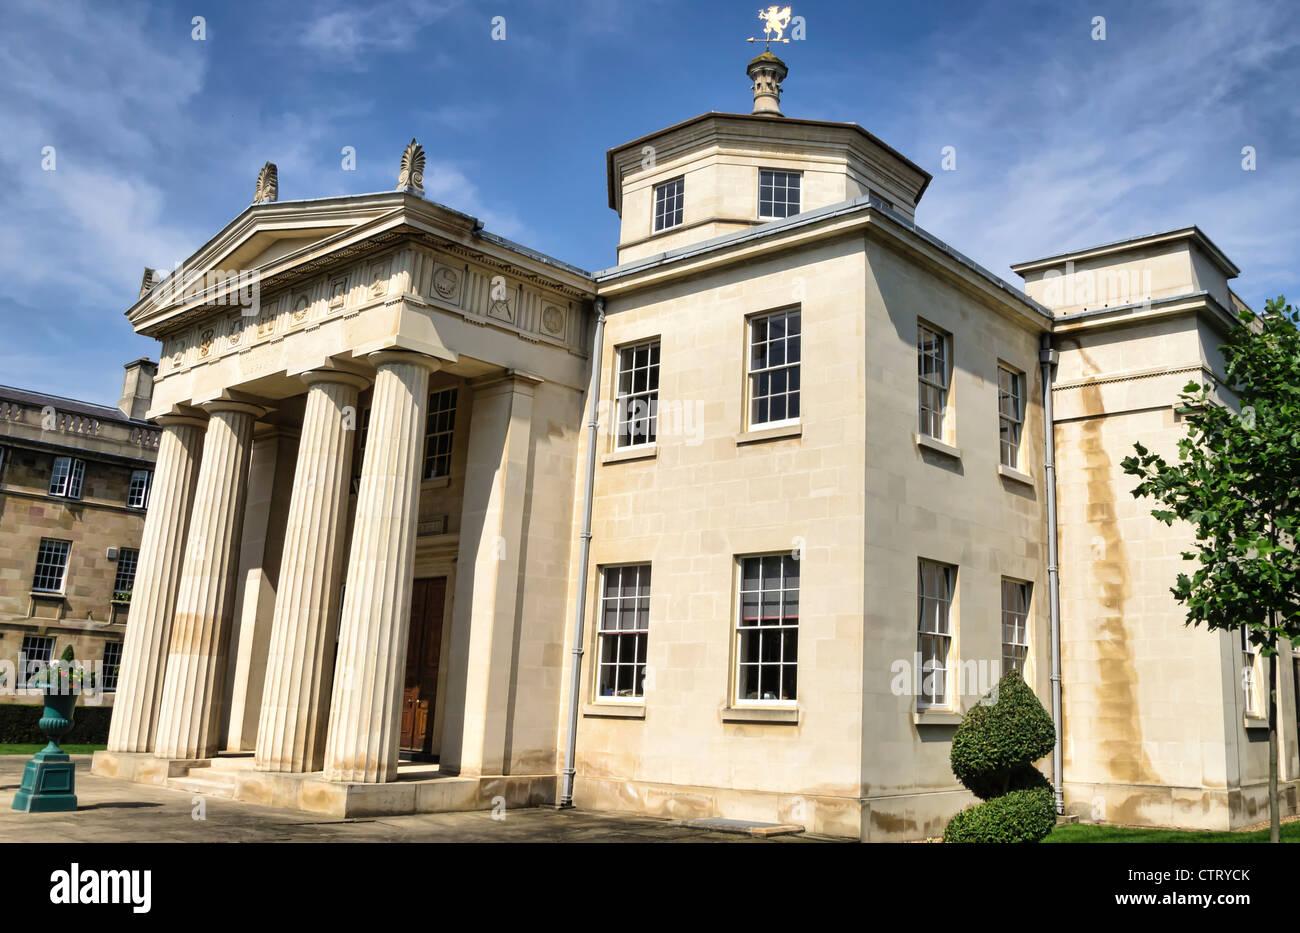 Downing College in Cambridge, UK Stockbild